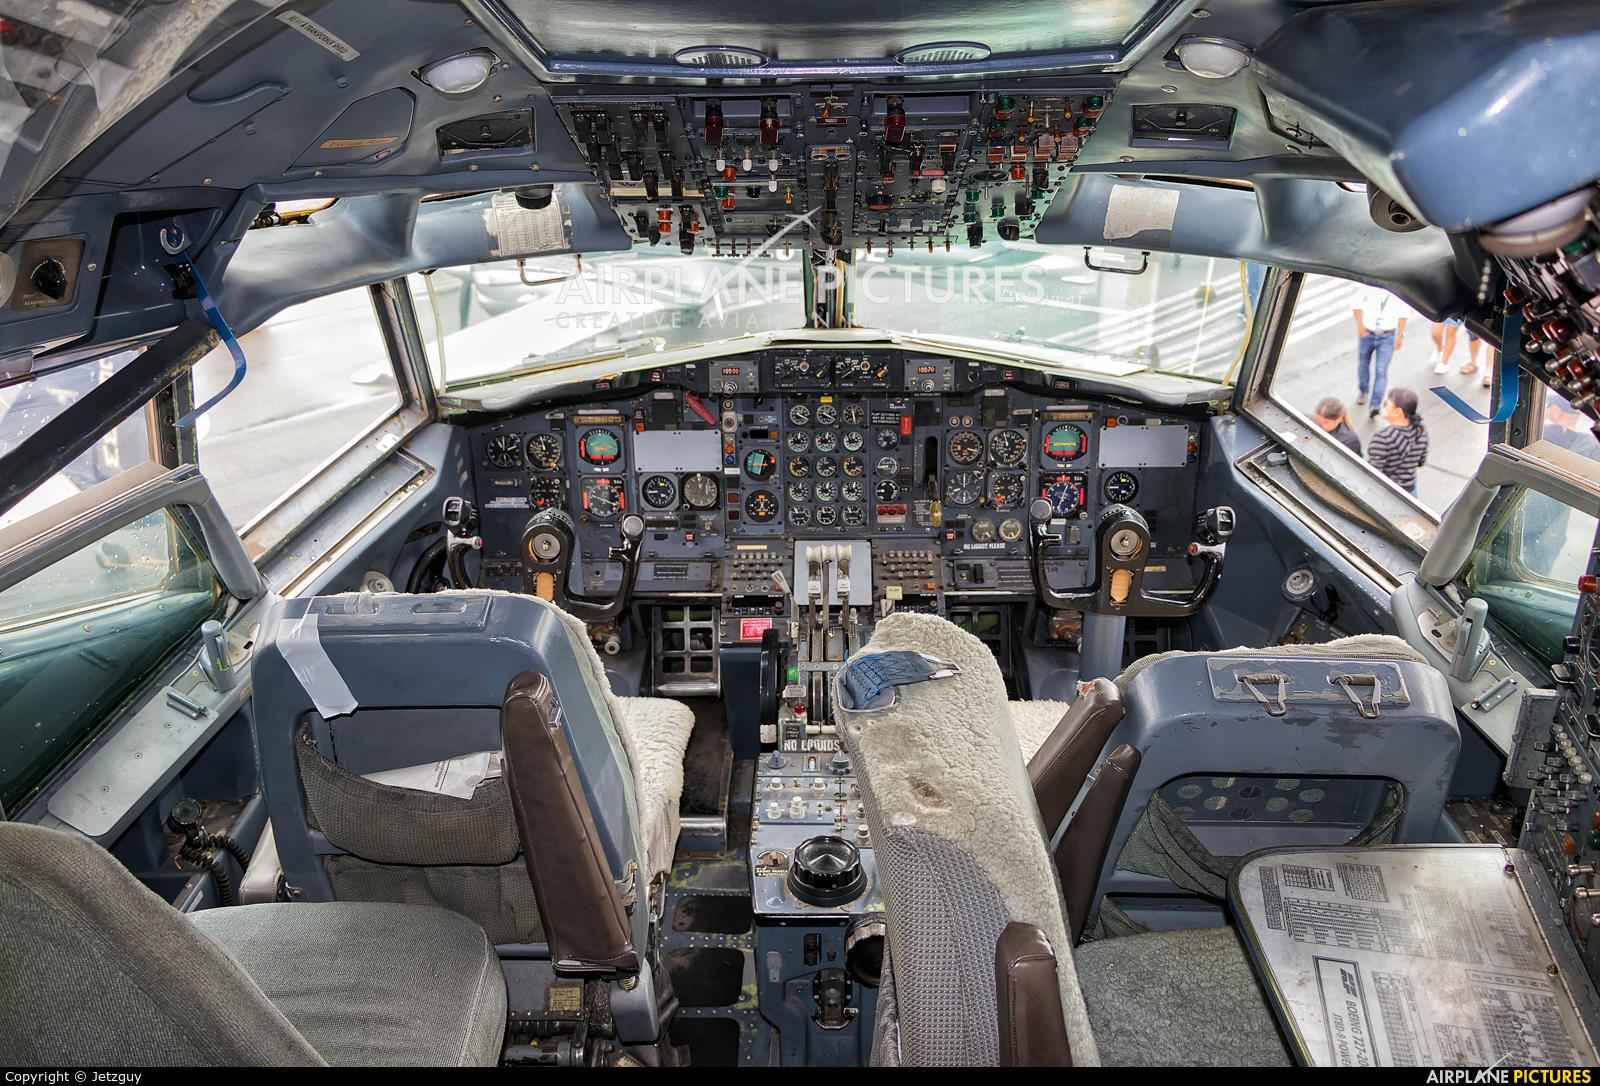 Purolator Courier (Kelowna Flightcraft Air Charter) C-GWKF aircraft at Abbotsford, BC